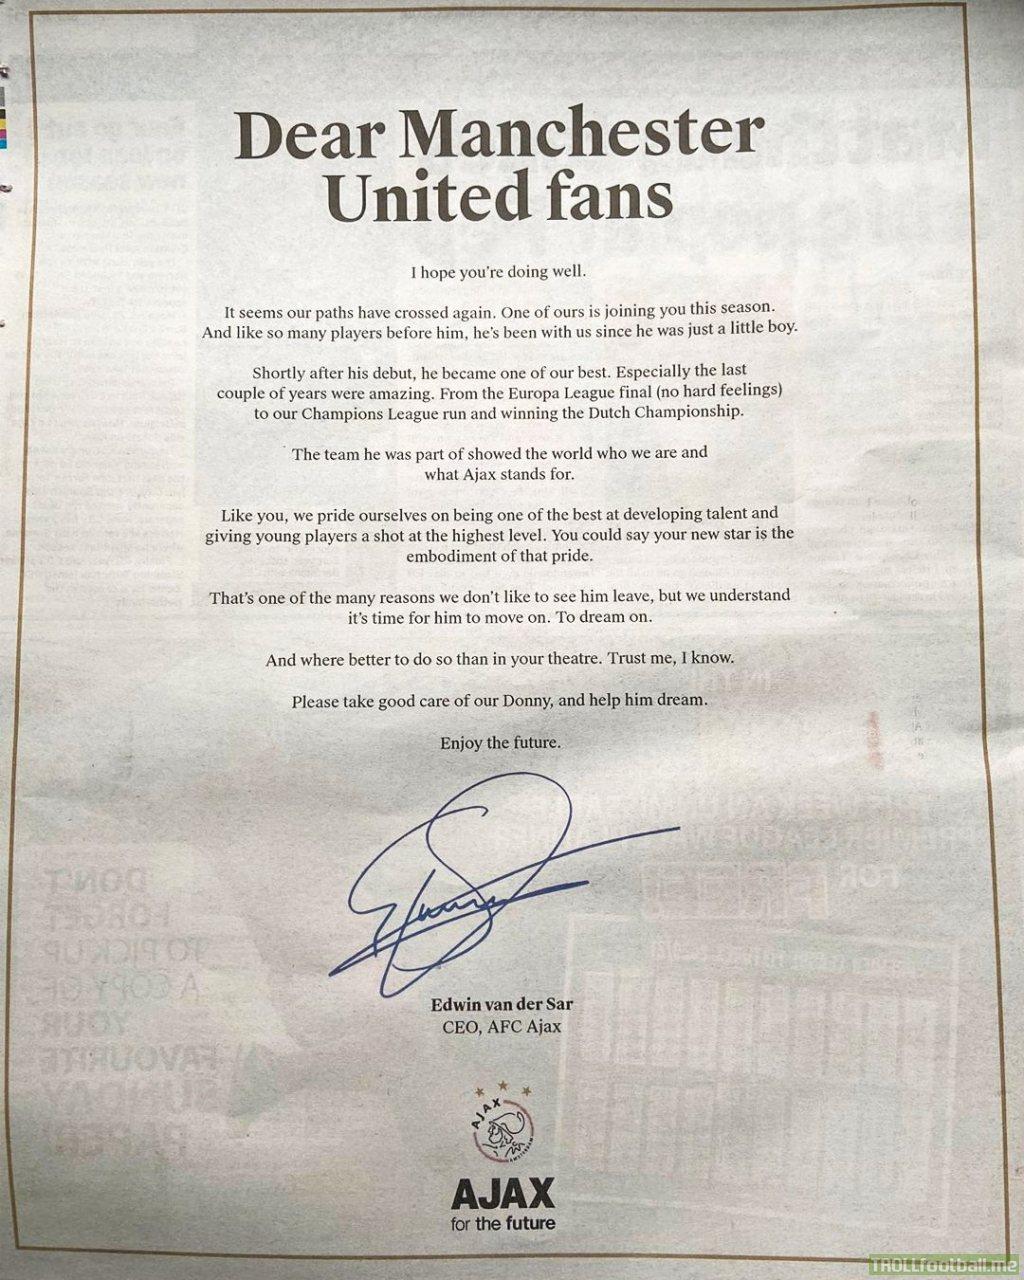 Edwin van der Sar's open letter to Manchester United on Donny van de Beek's transfer